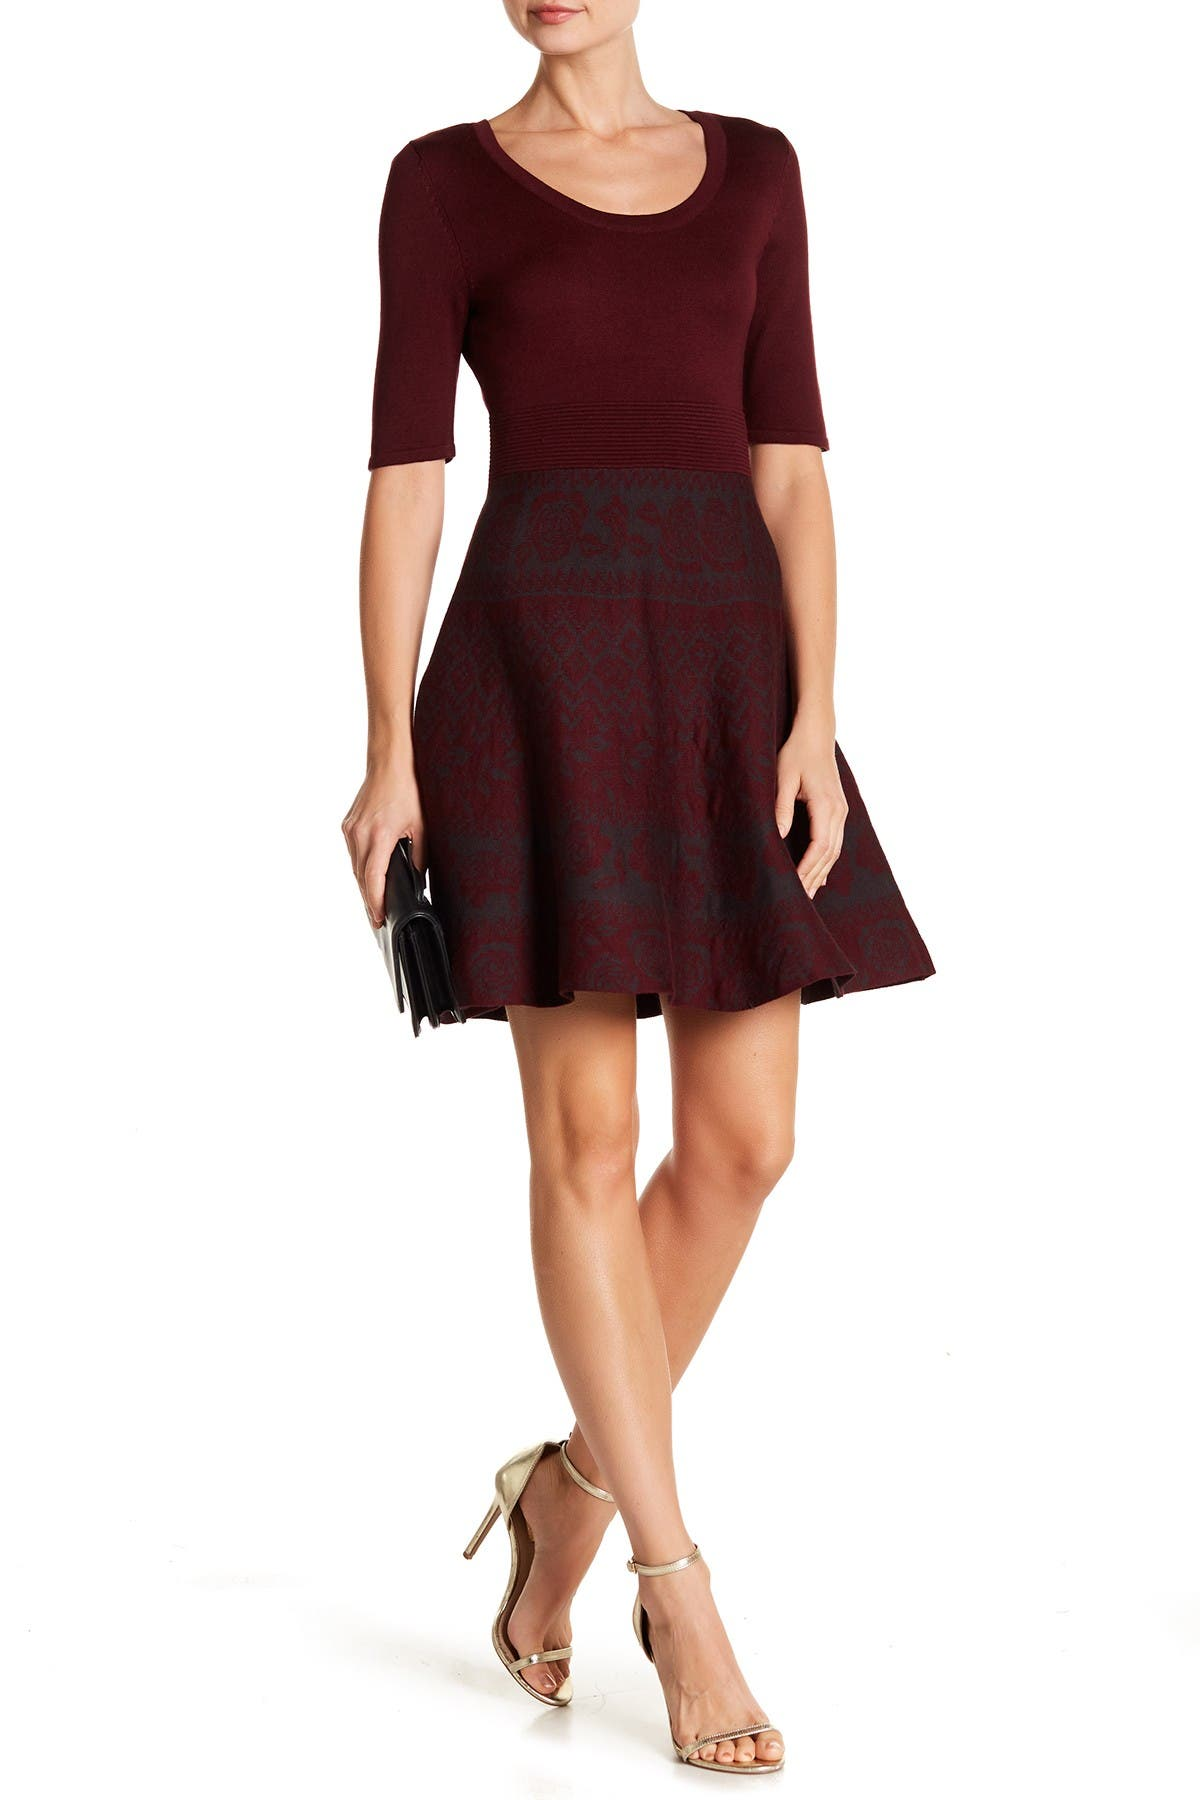 Image of Nina Leonard Scoop Neck Fit & Flare Knit Dress